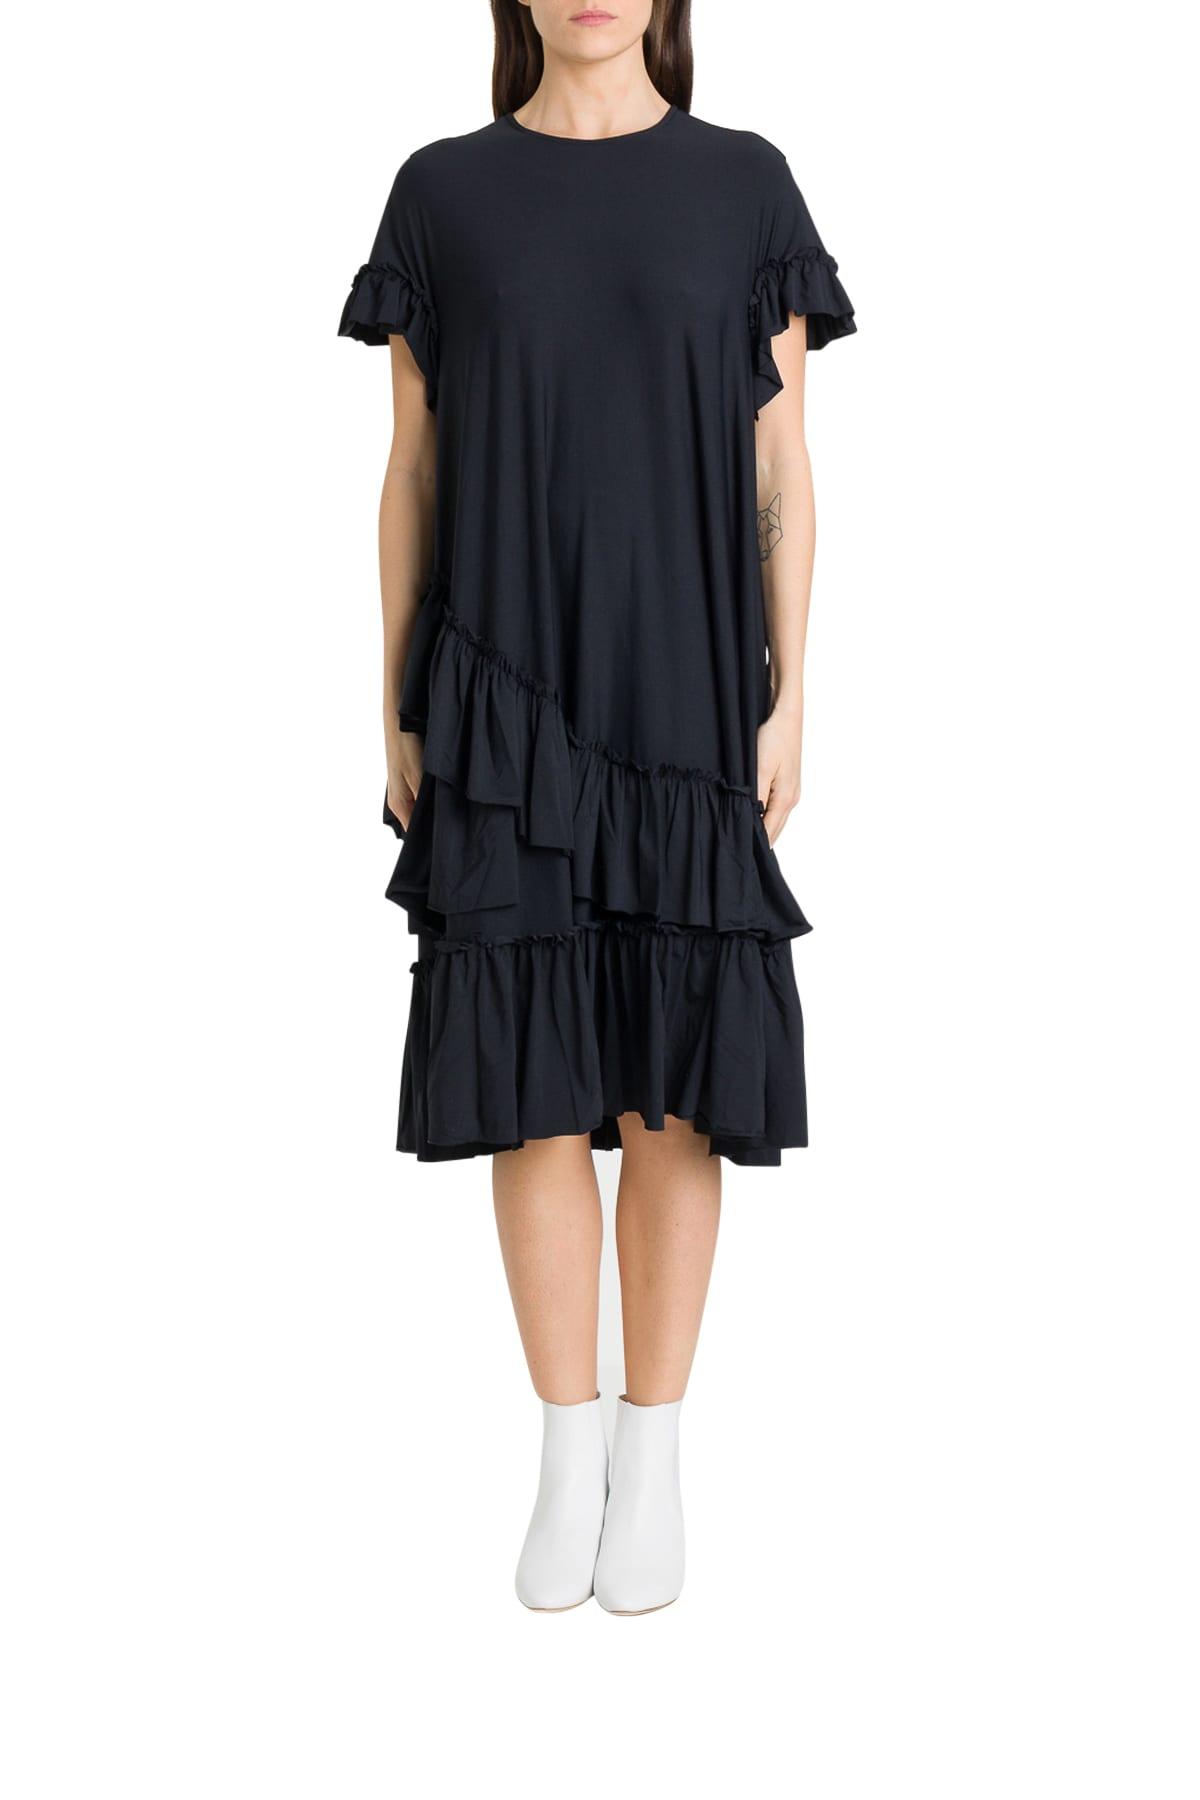 Buy Simone Rocha Flounces Midi Dress online, shop Simone Rocha with free shipping